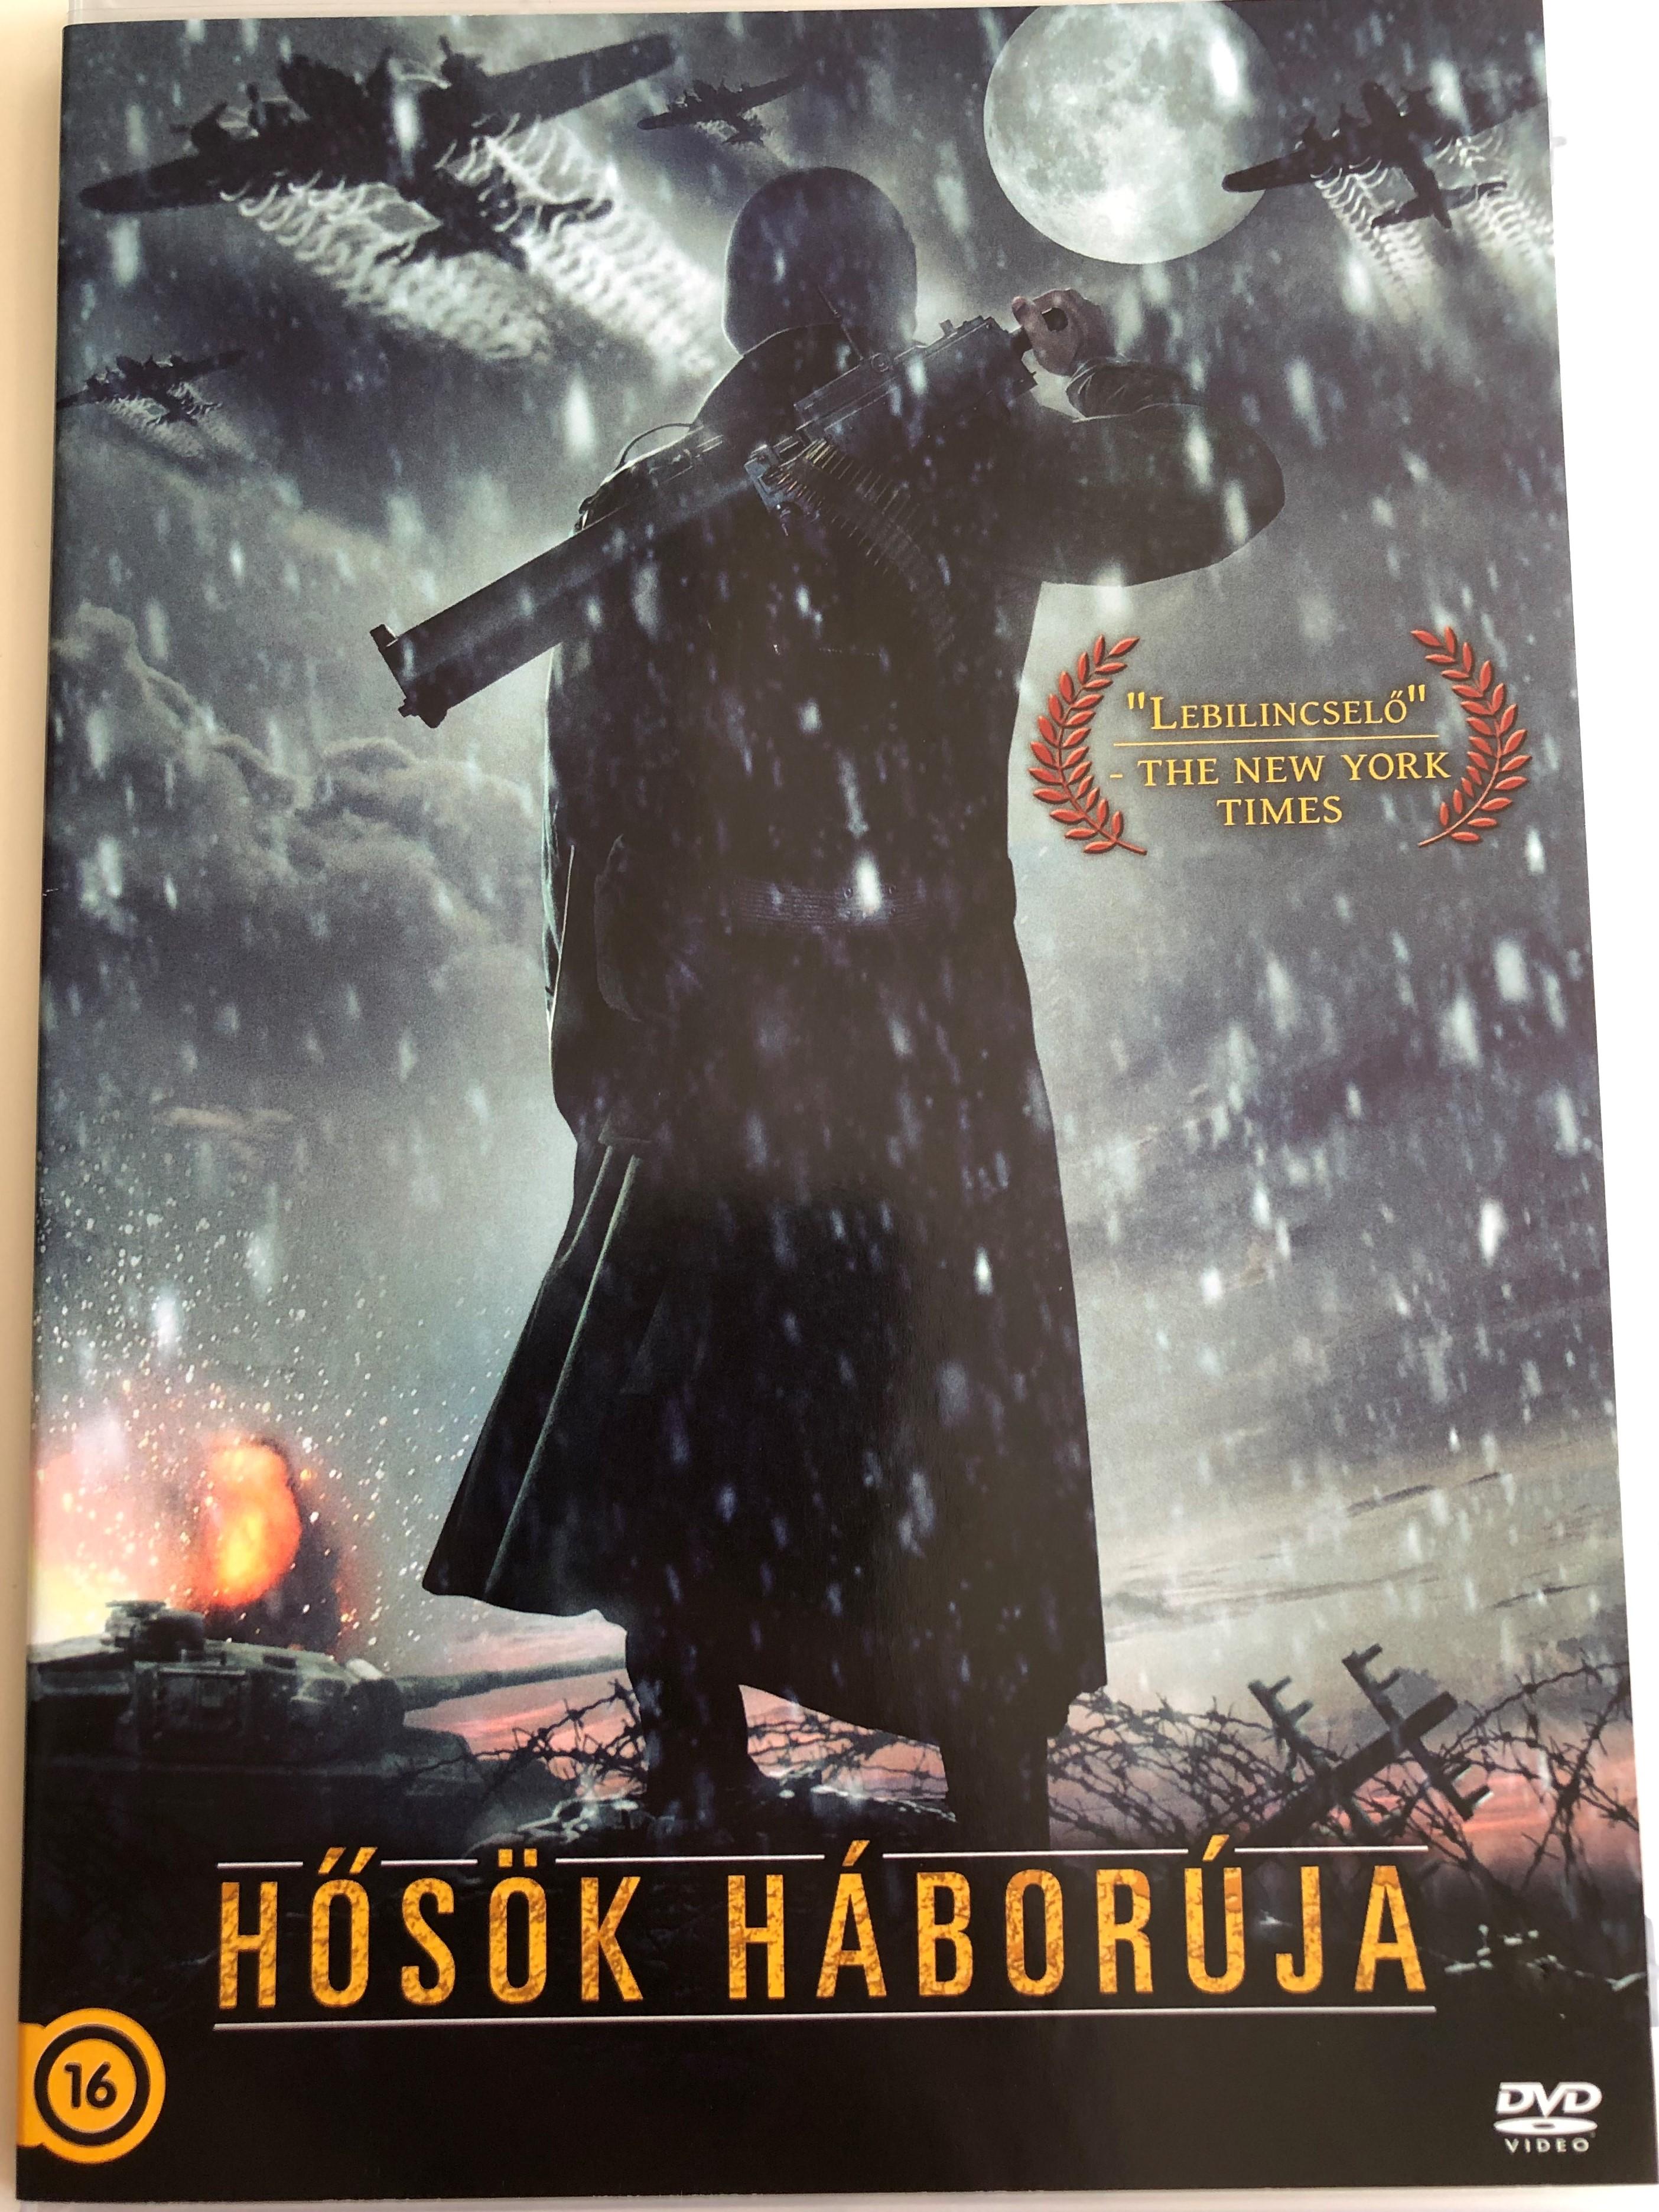 everyman-s-war-dvd-2010-h-s-k-h-bor-ja-directed-by-thad-t.-smith-starring-cole-carson-eric-reid-mike-prosser-sean-mcgrath-1-.jpg